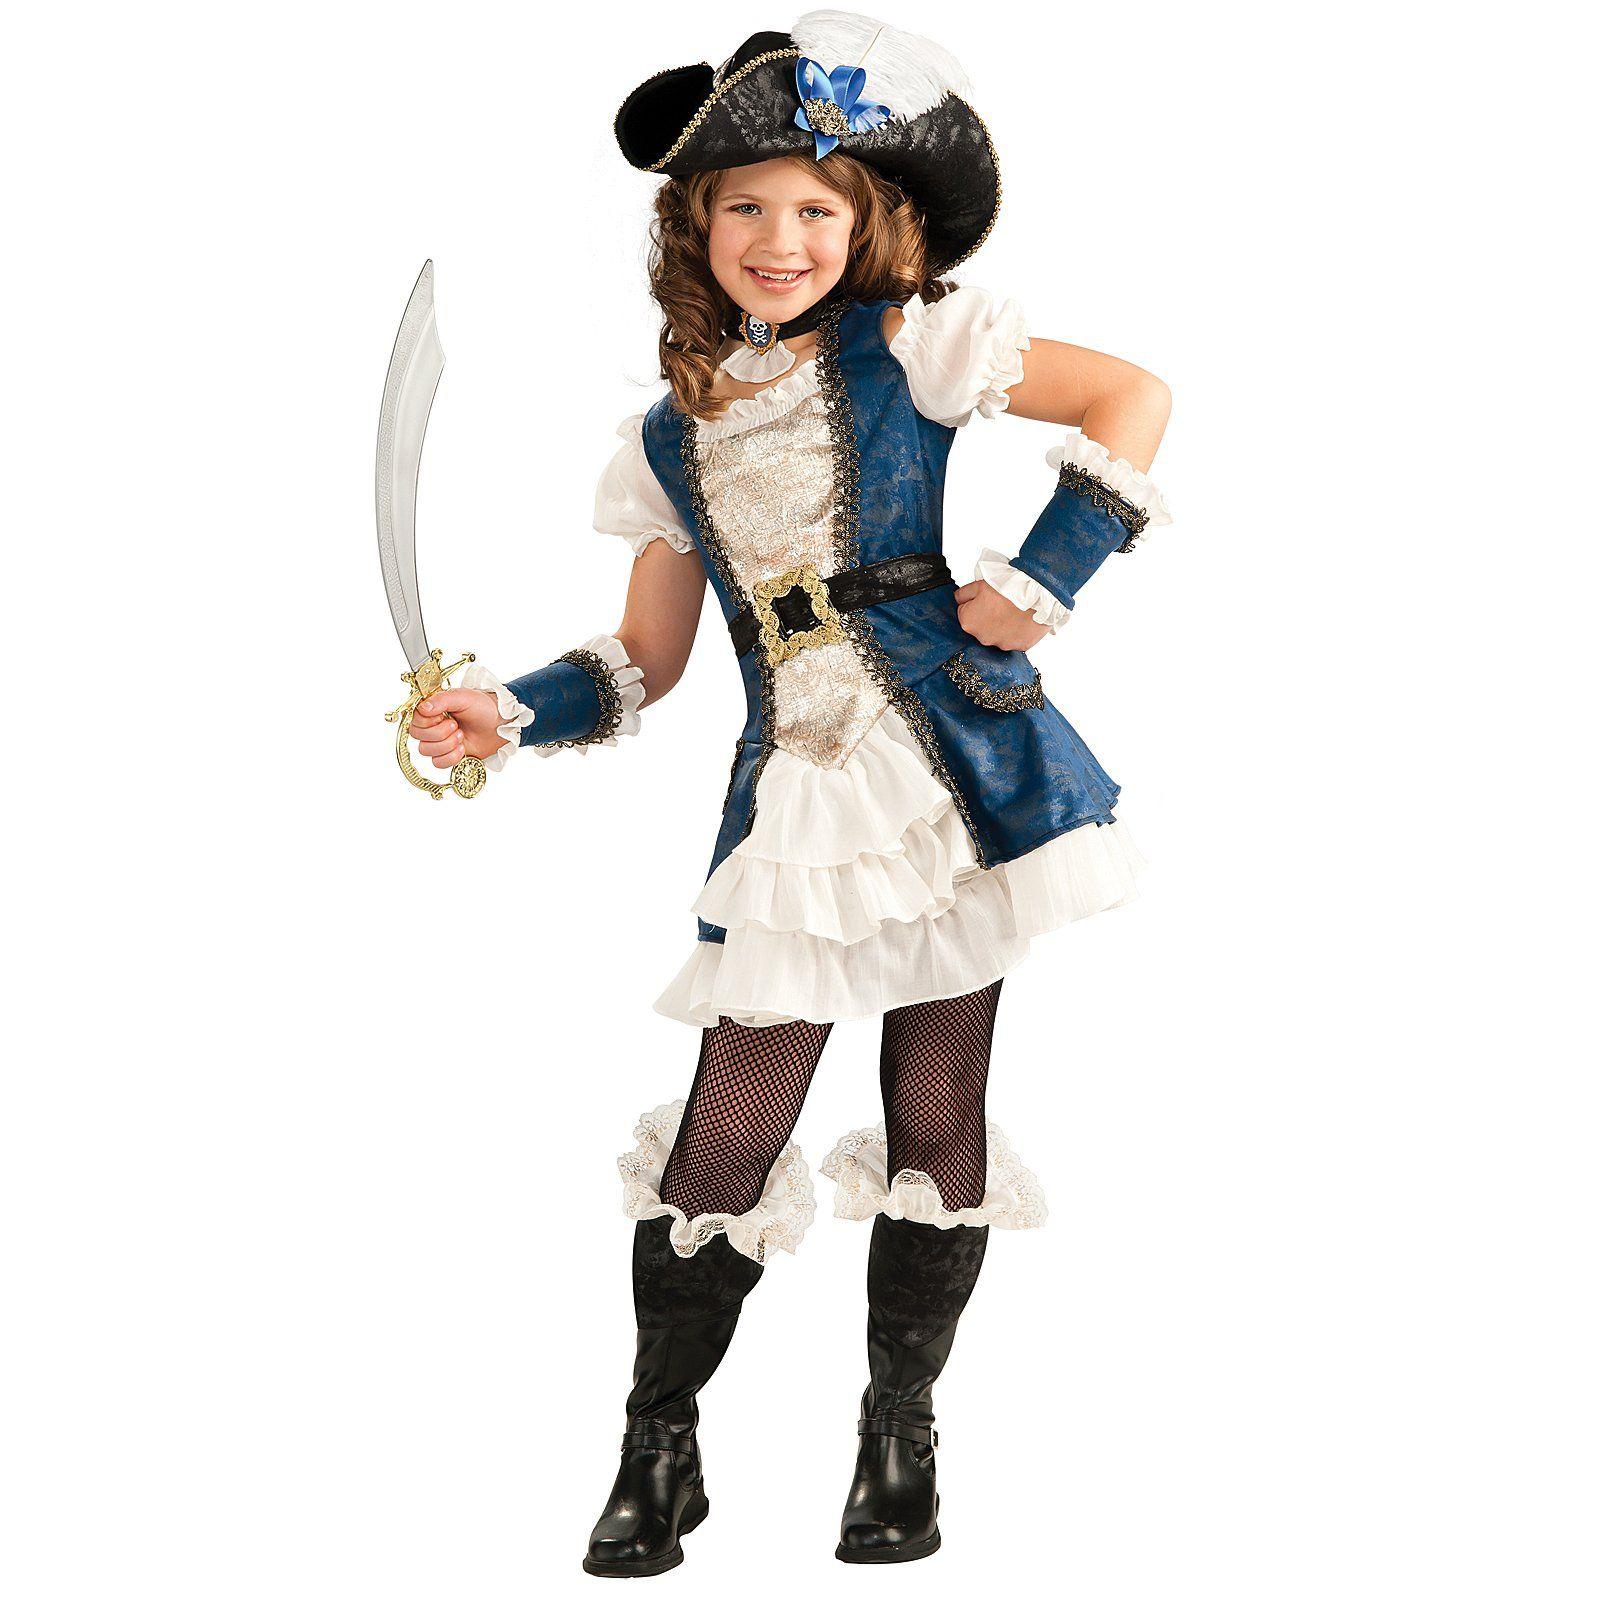 Little Girl Pirate Costume Ideas Homemade. 12 best pirate costume ...